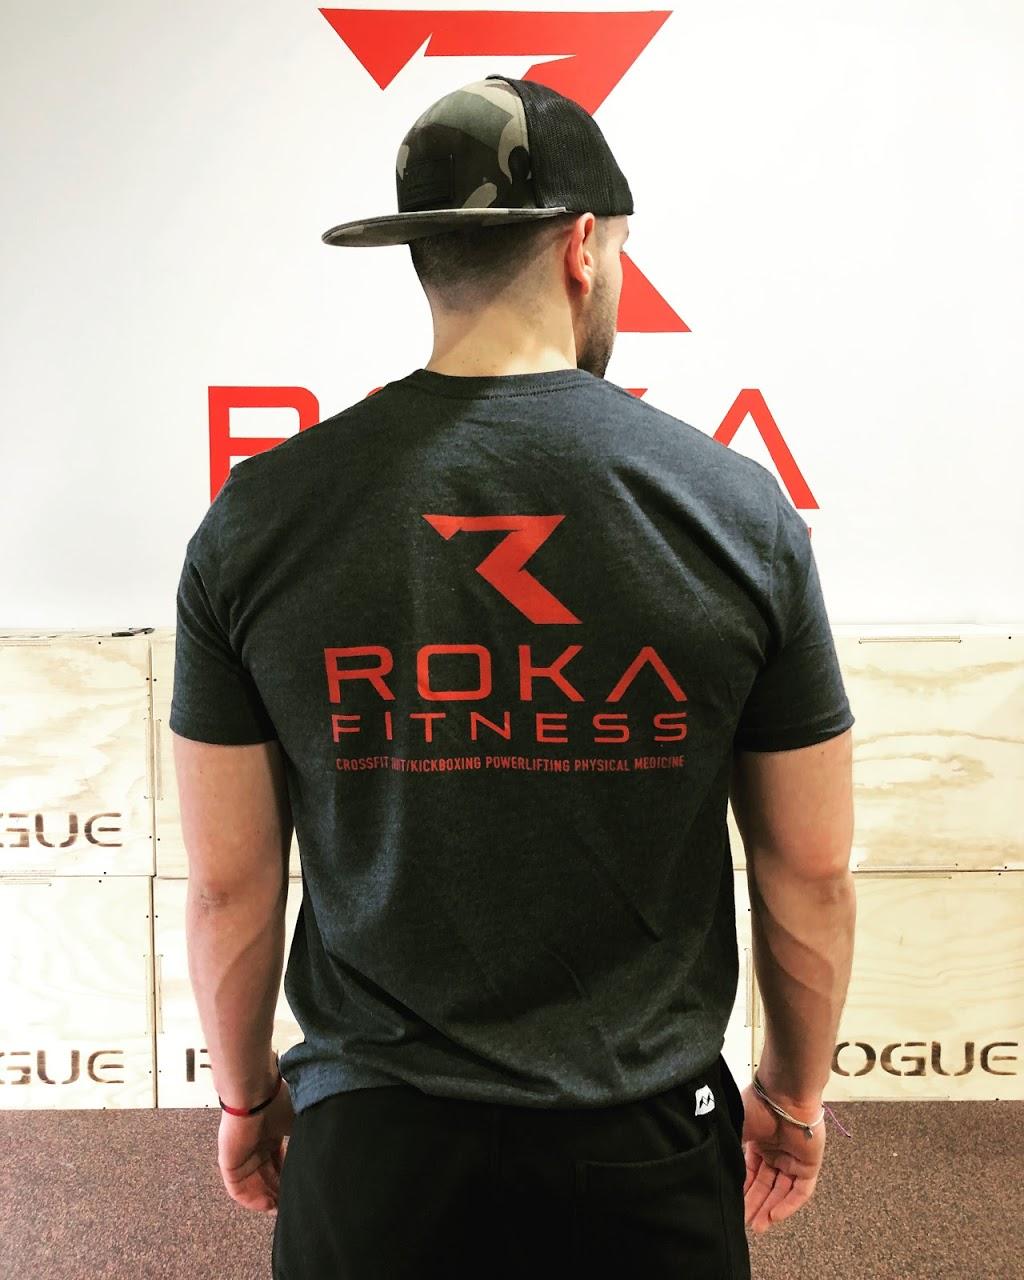 RK512 - gym  | Photo 6 of 10 | Address: 7601 S Congress Ave #500, Austin, TX 78745, USA | Phone: (512) 922-8423